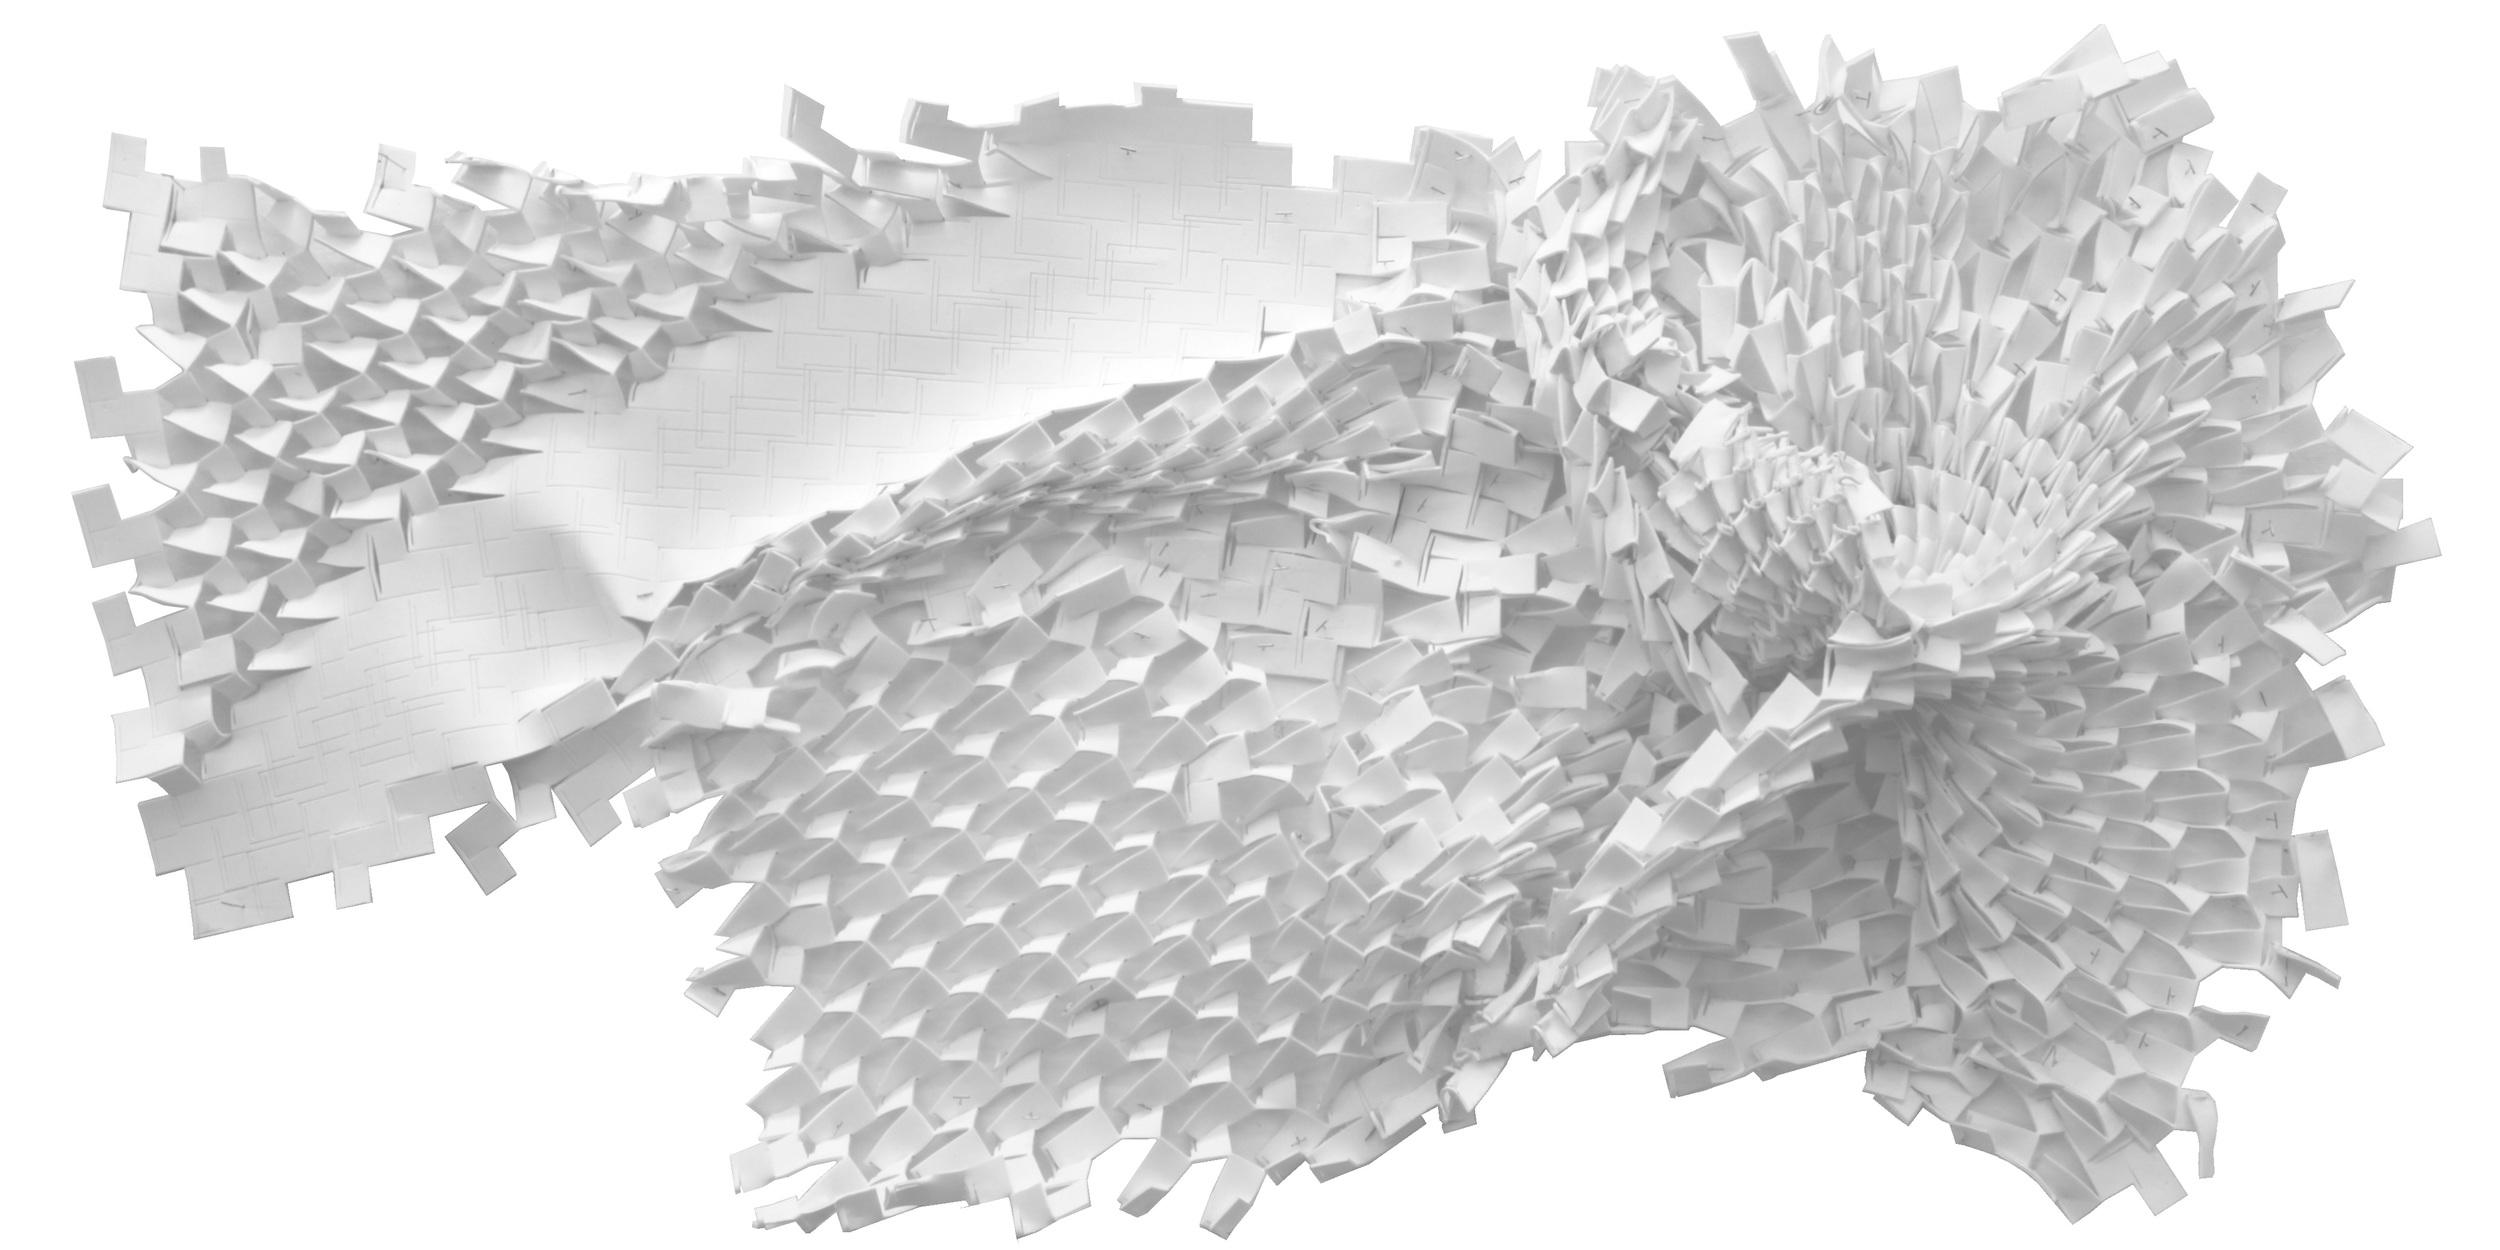 phys-model.jpg